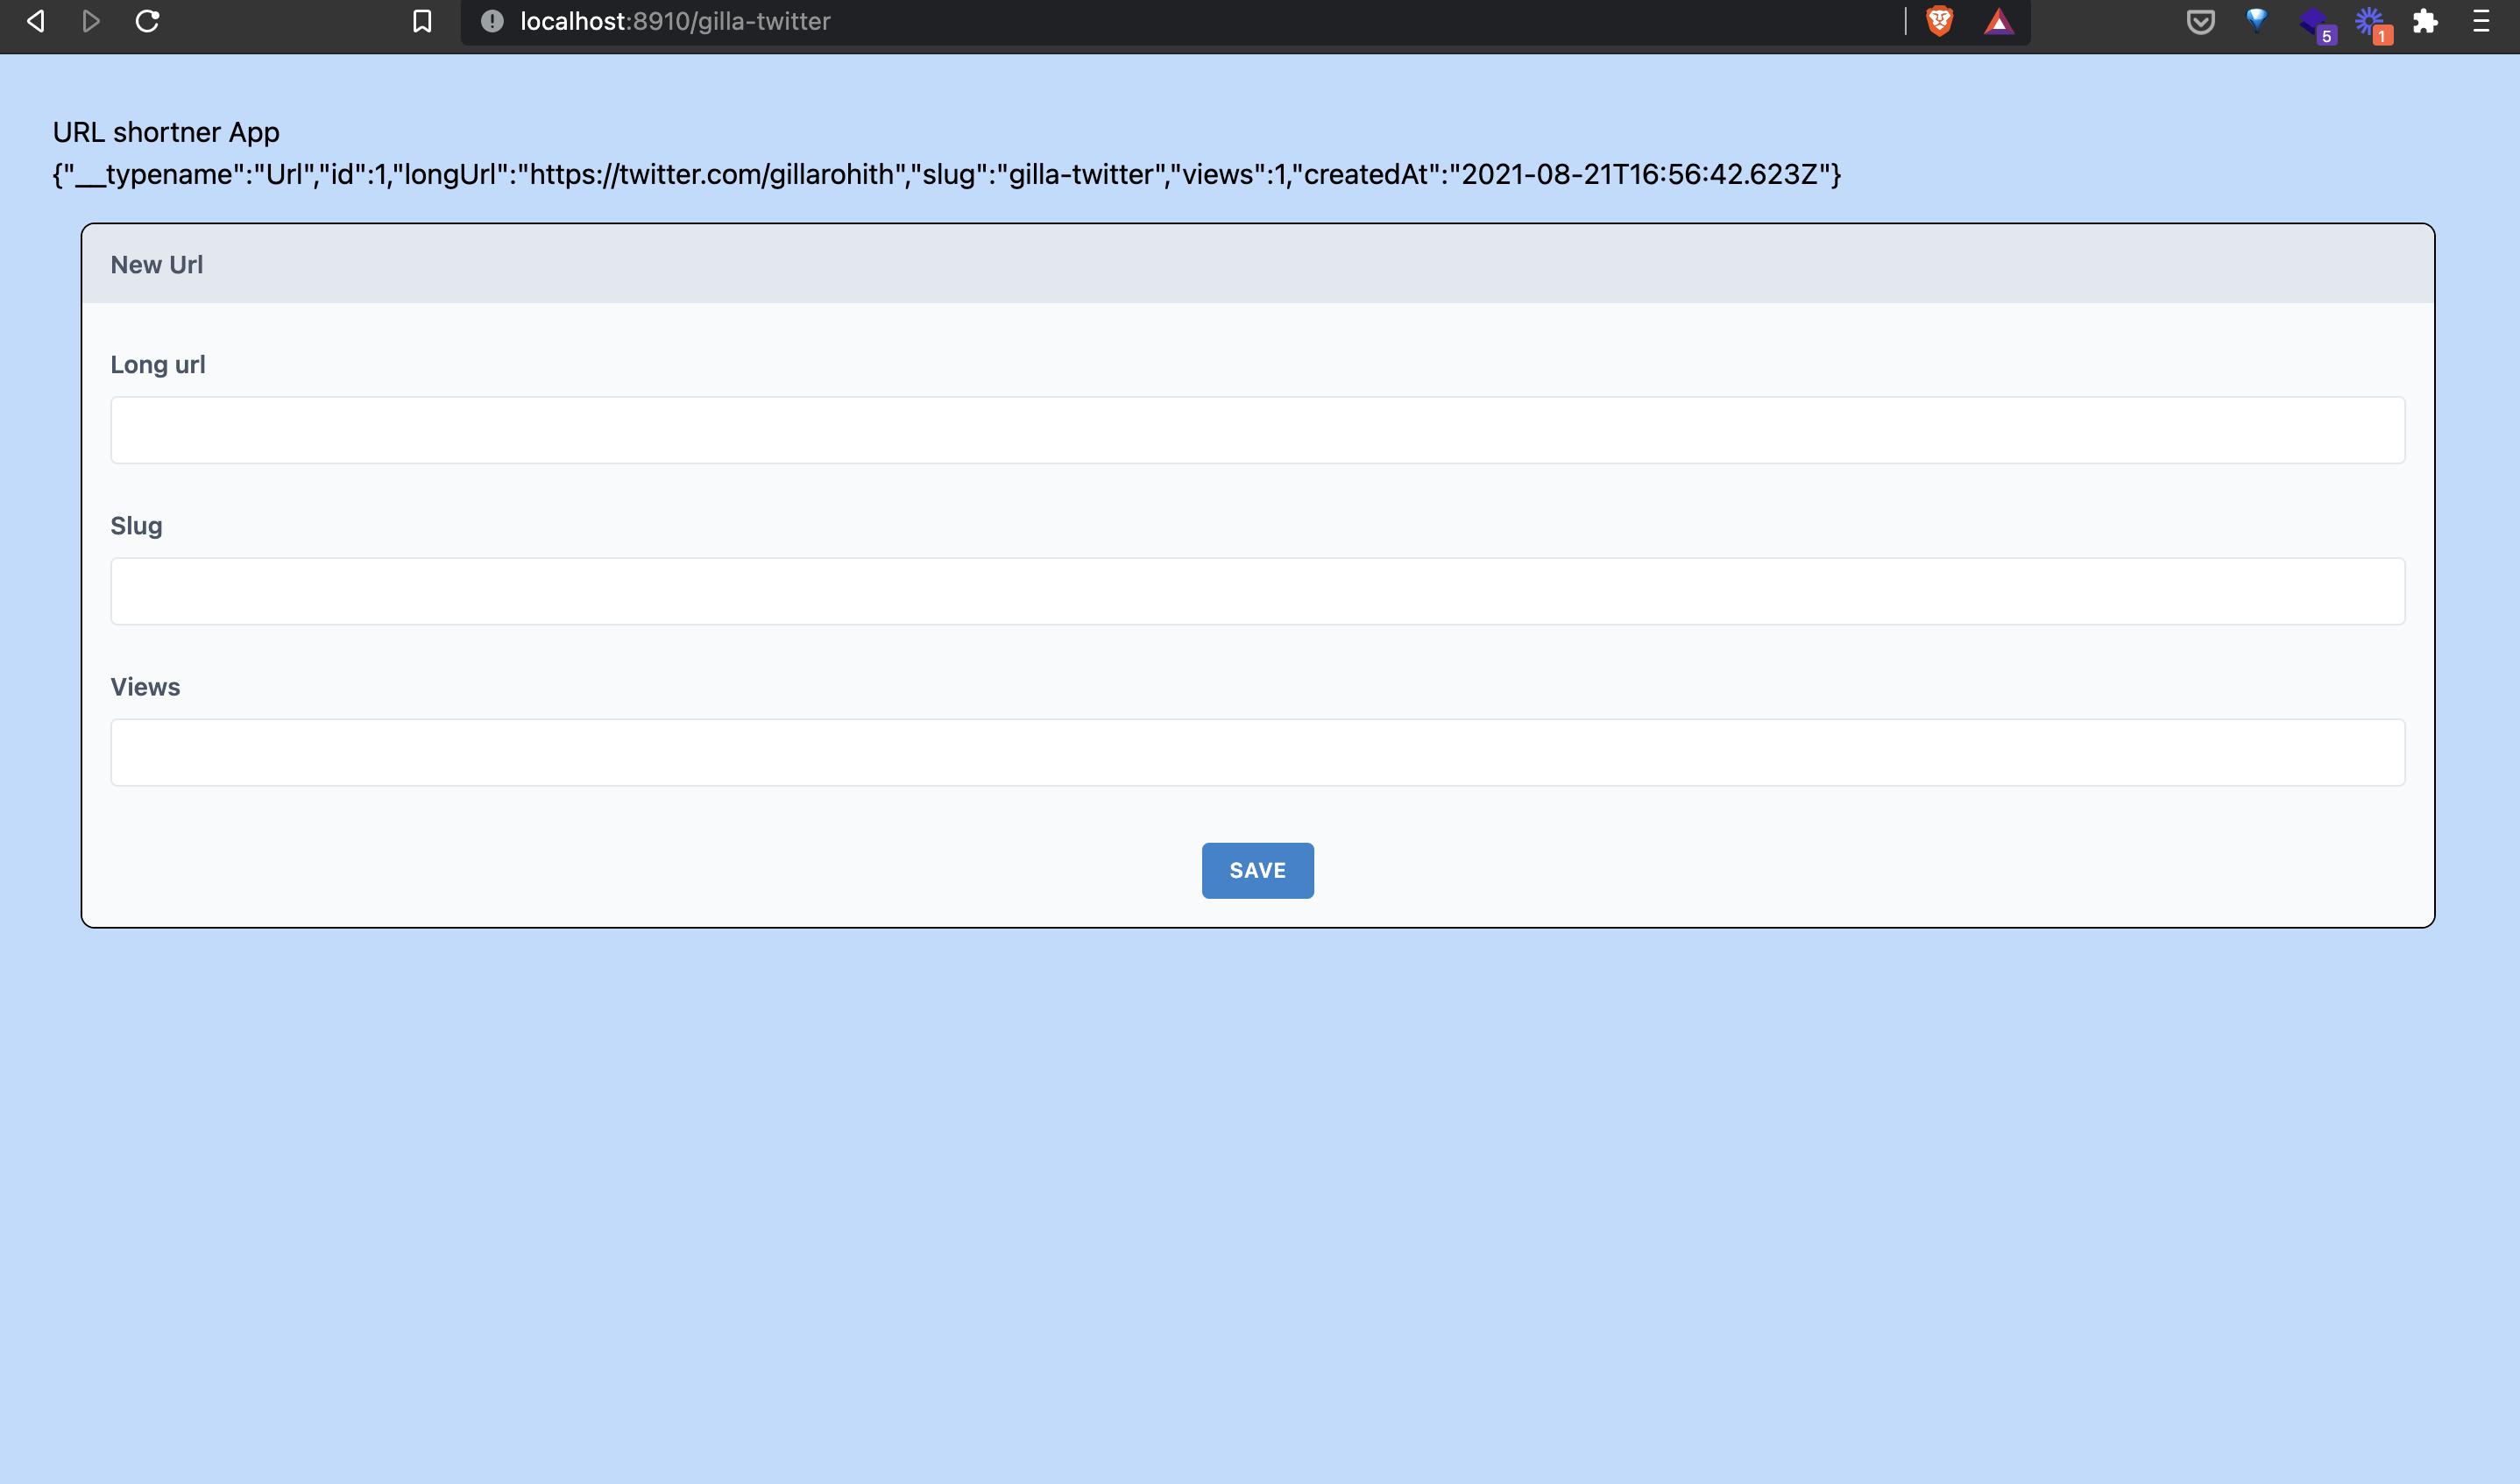 https://res.cloudinary.com/rohith-gilla/image/upload/v1629723173/Blog/RedwoodJS/Screenshot_2021-08-23_at_6.22.46_PM_c7yzxh.png